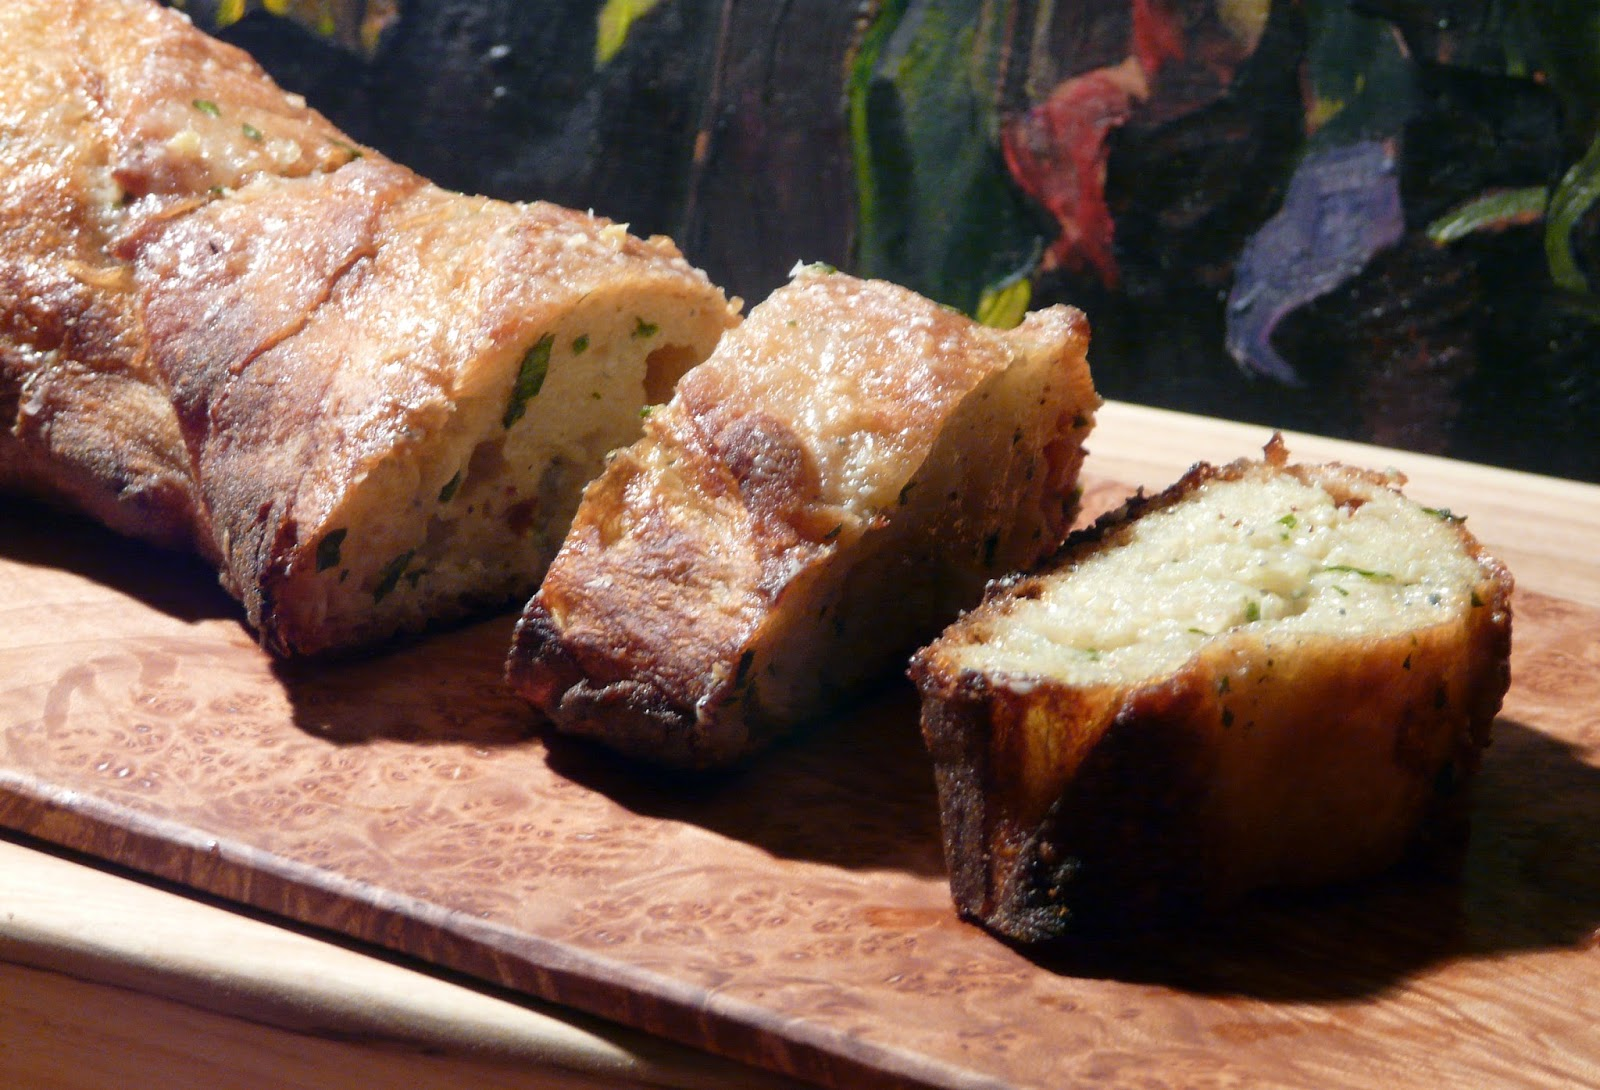 Thibeault's Table: Pasta Puttanesca with Gorgonzola Garlic Bread